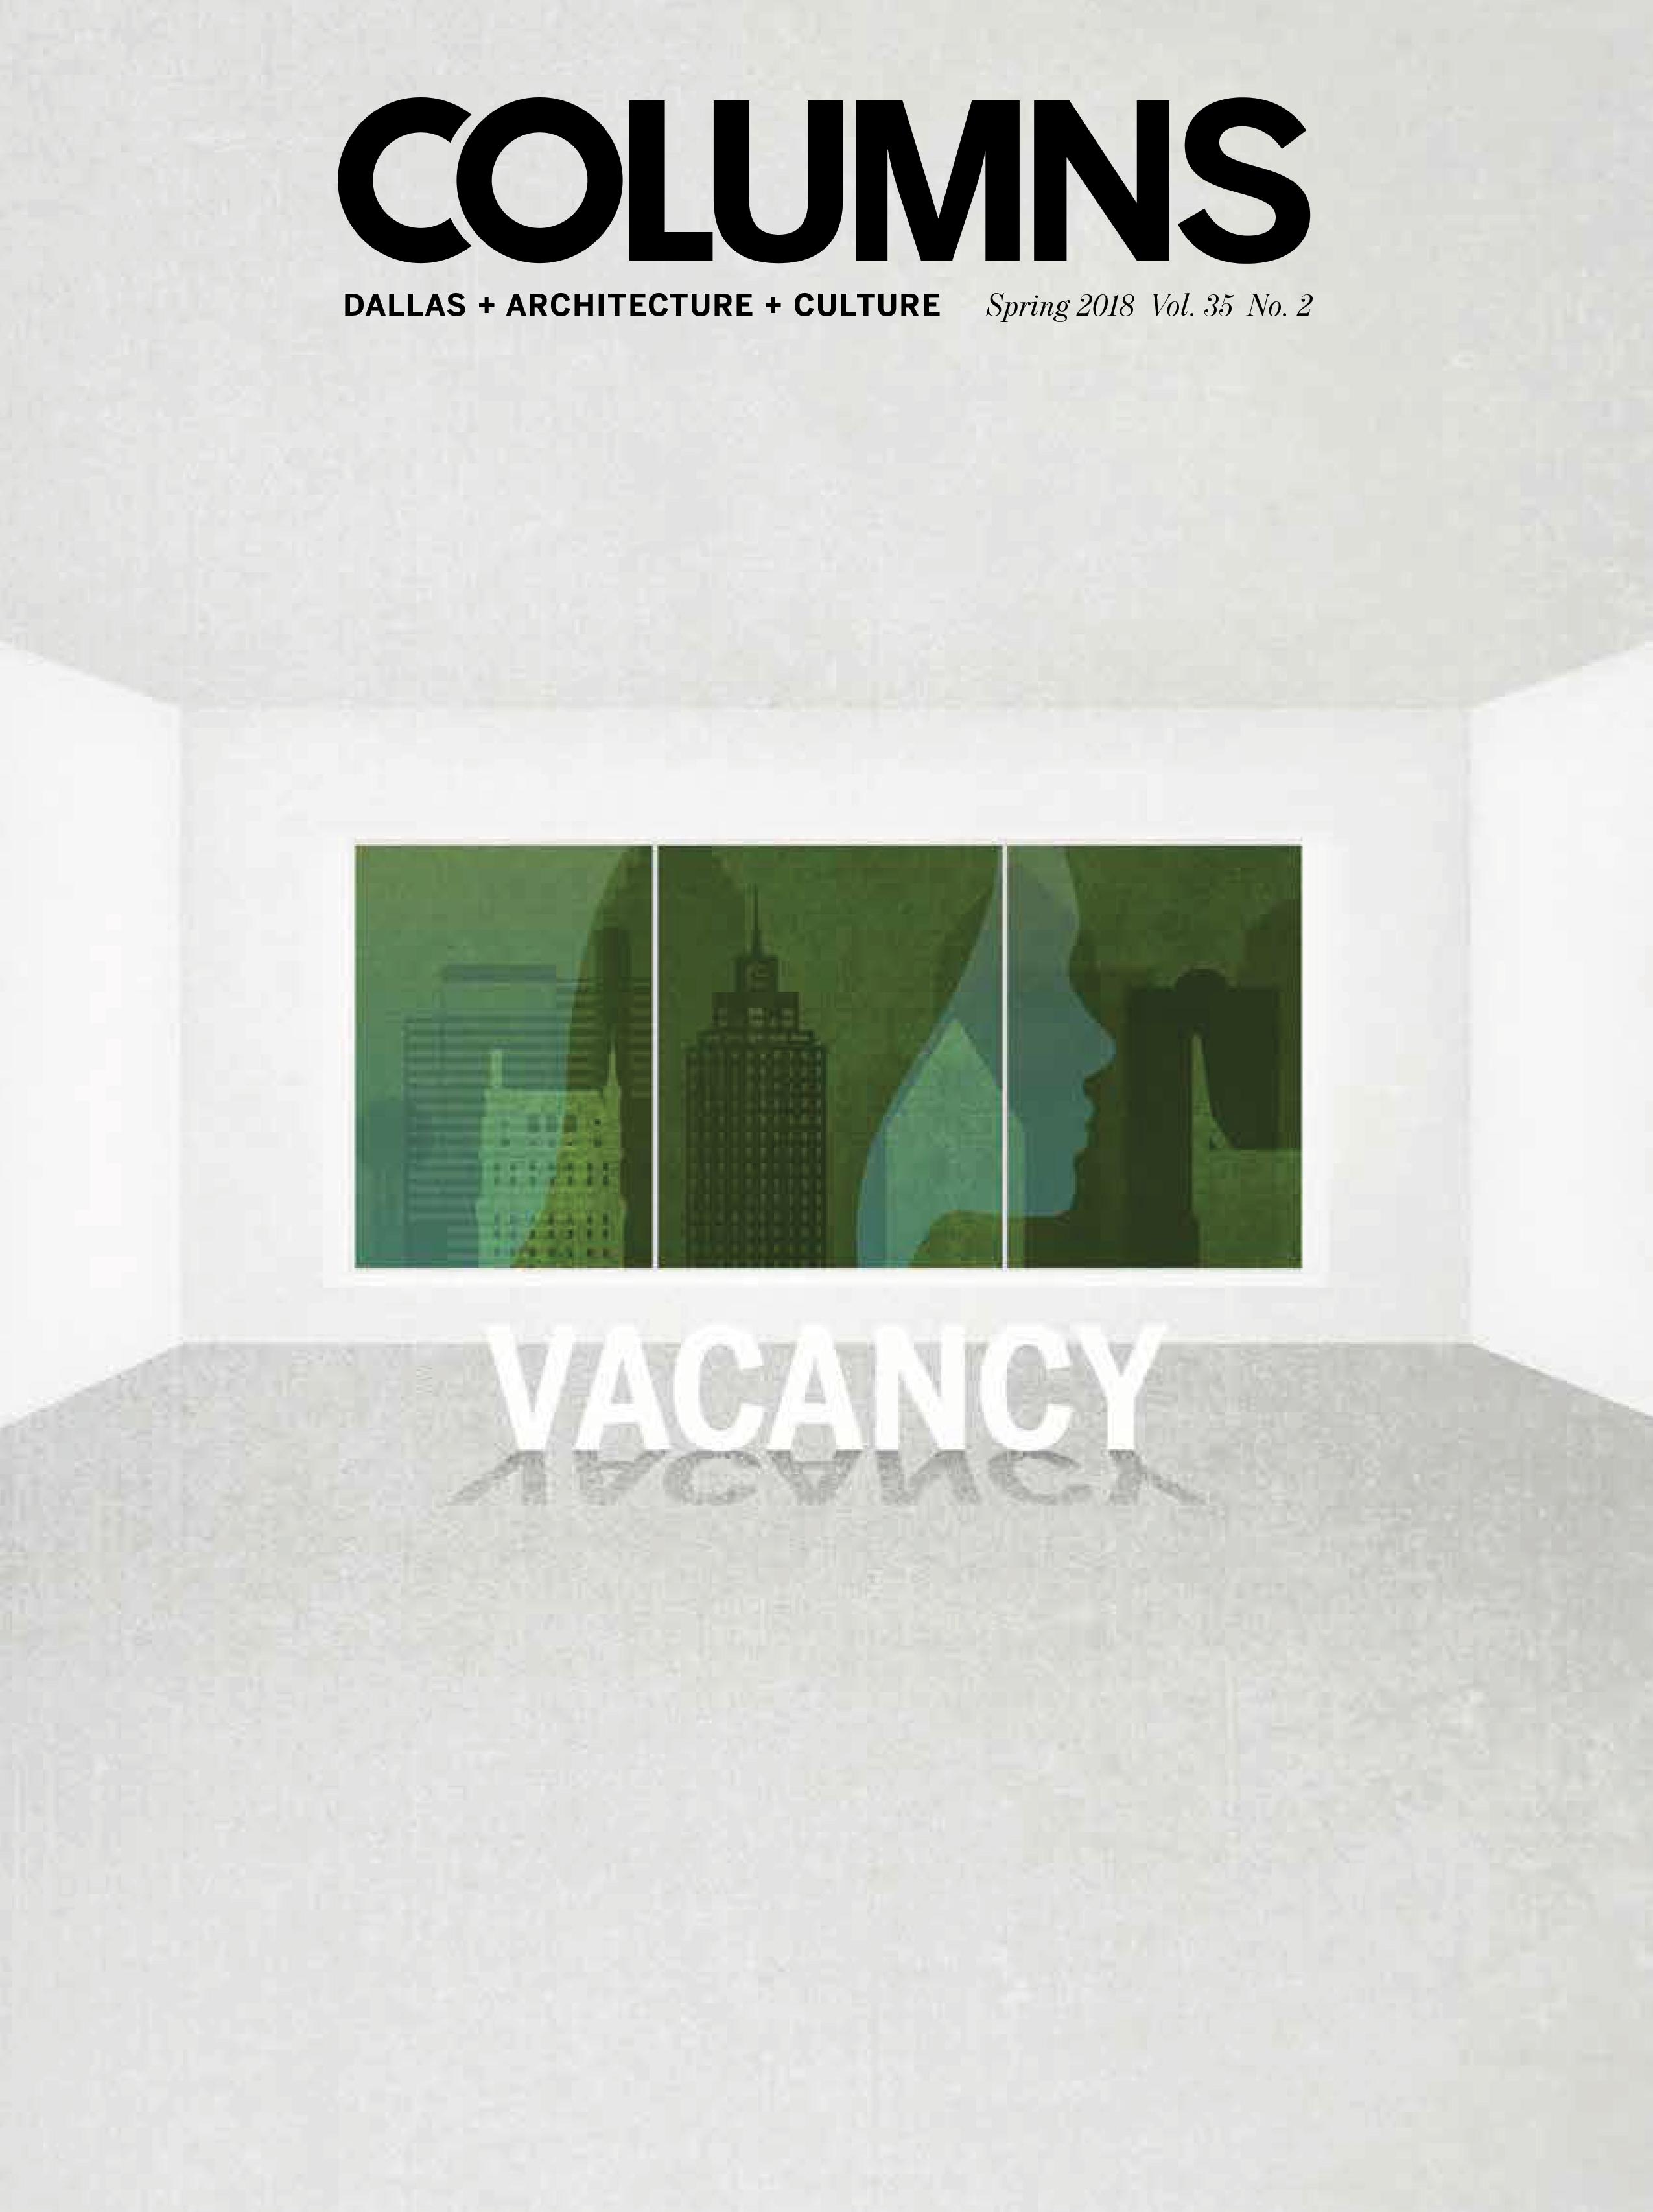 Columns magazine